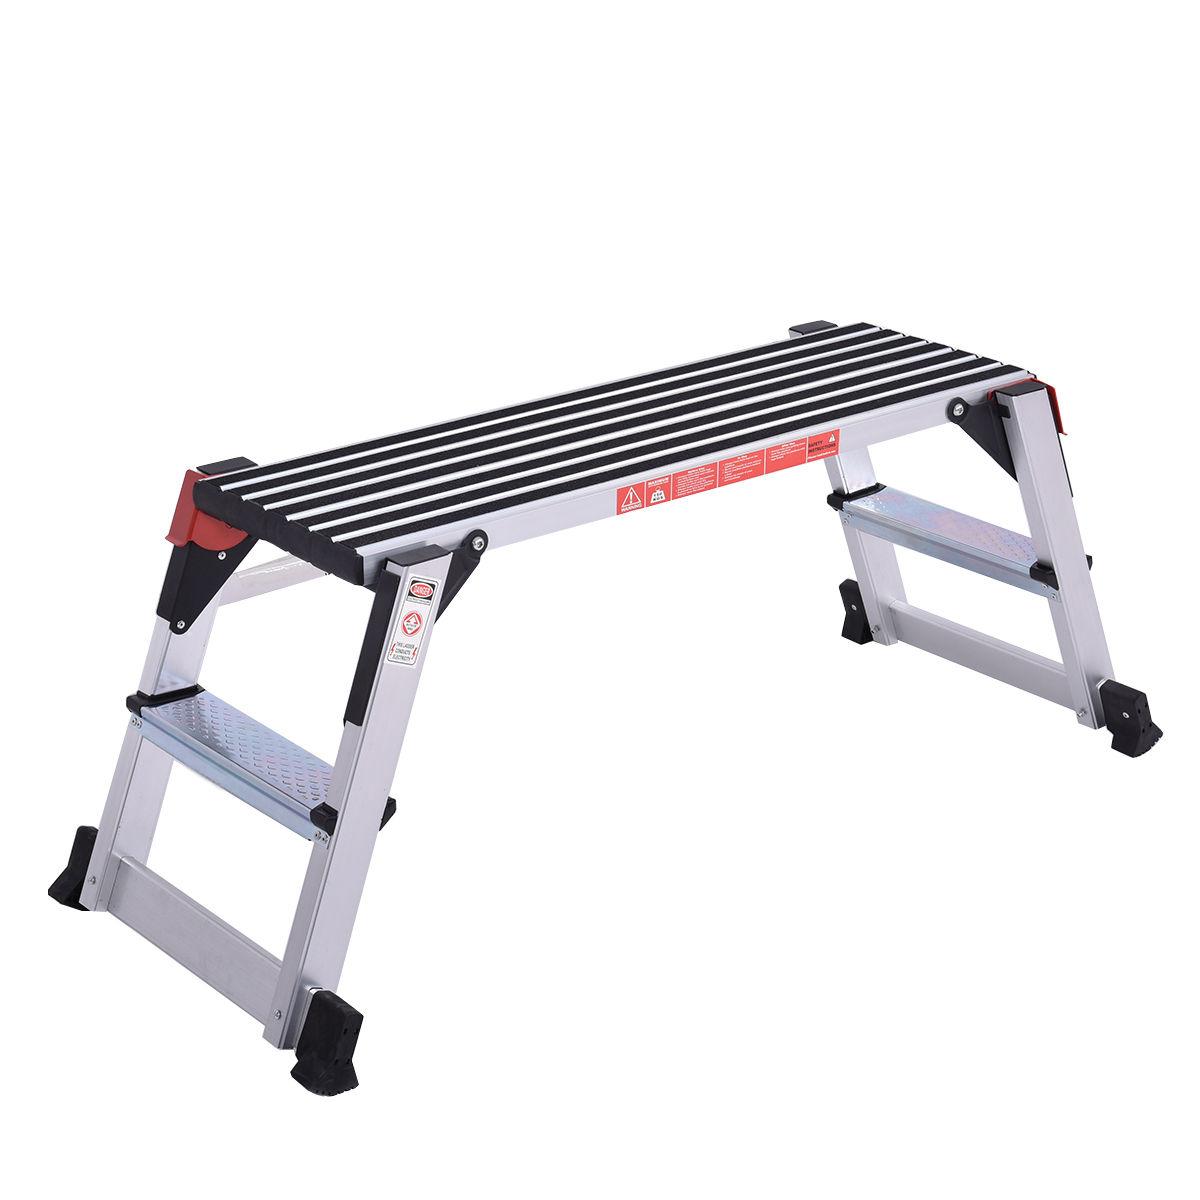 Costway Aluminum Step Stool Work Platform Folding Bench Drywall Ladder 330lbs Capacity